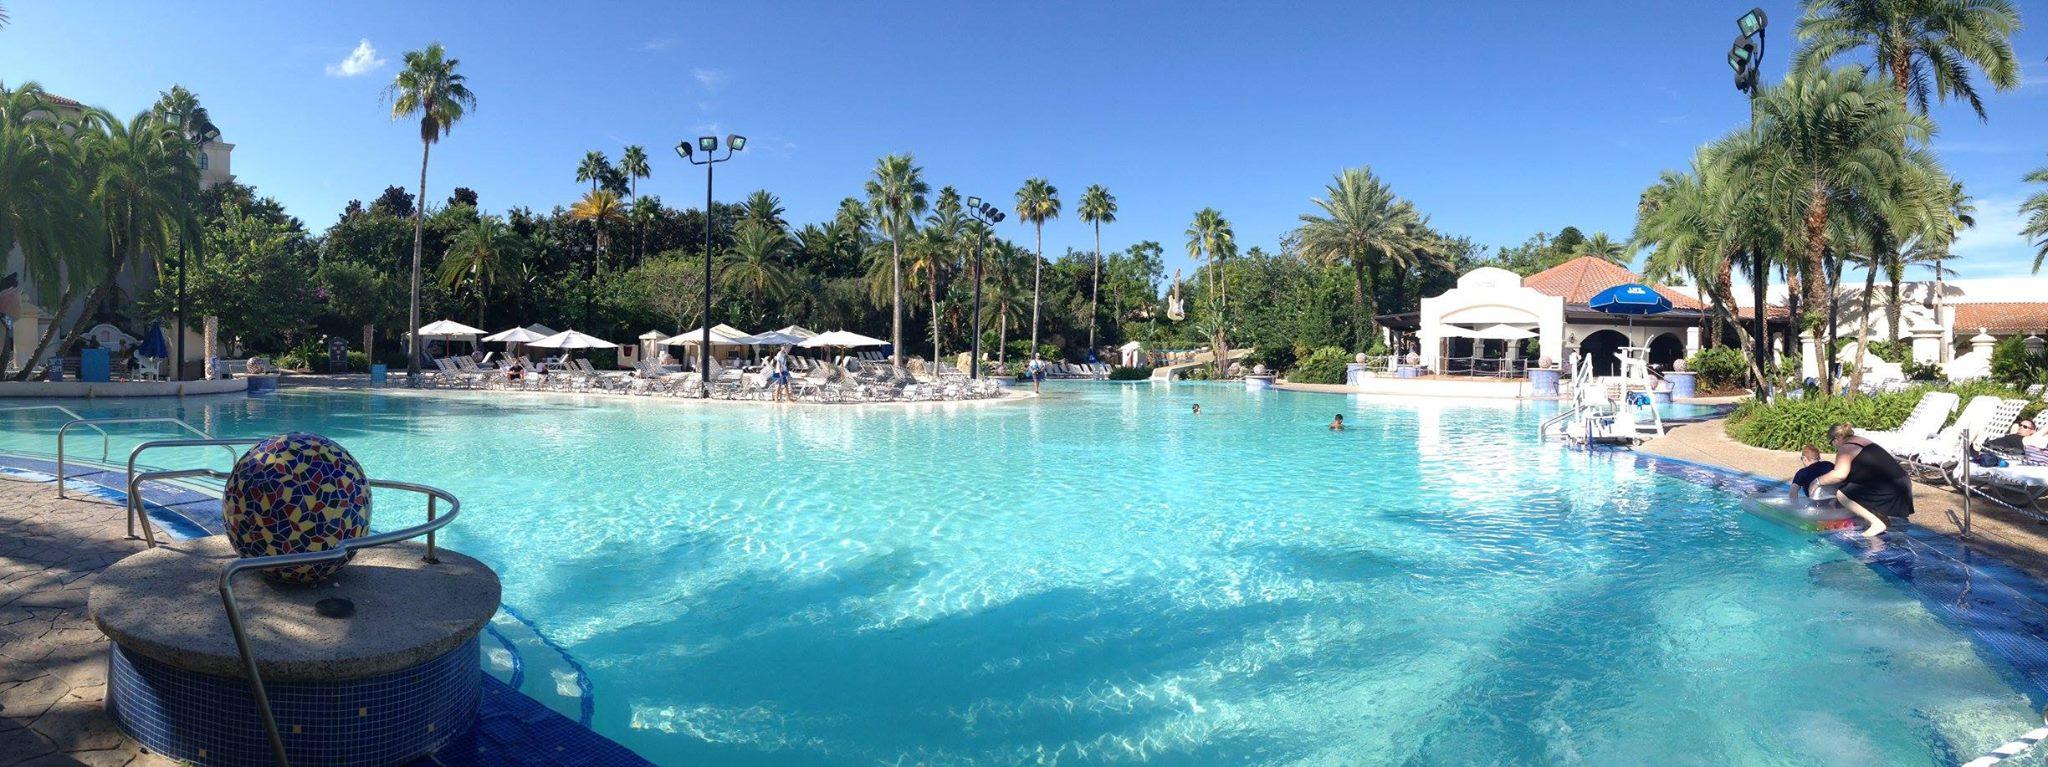 Universal Orlando Hard Rock Hotel Pool Tour